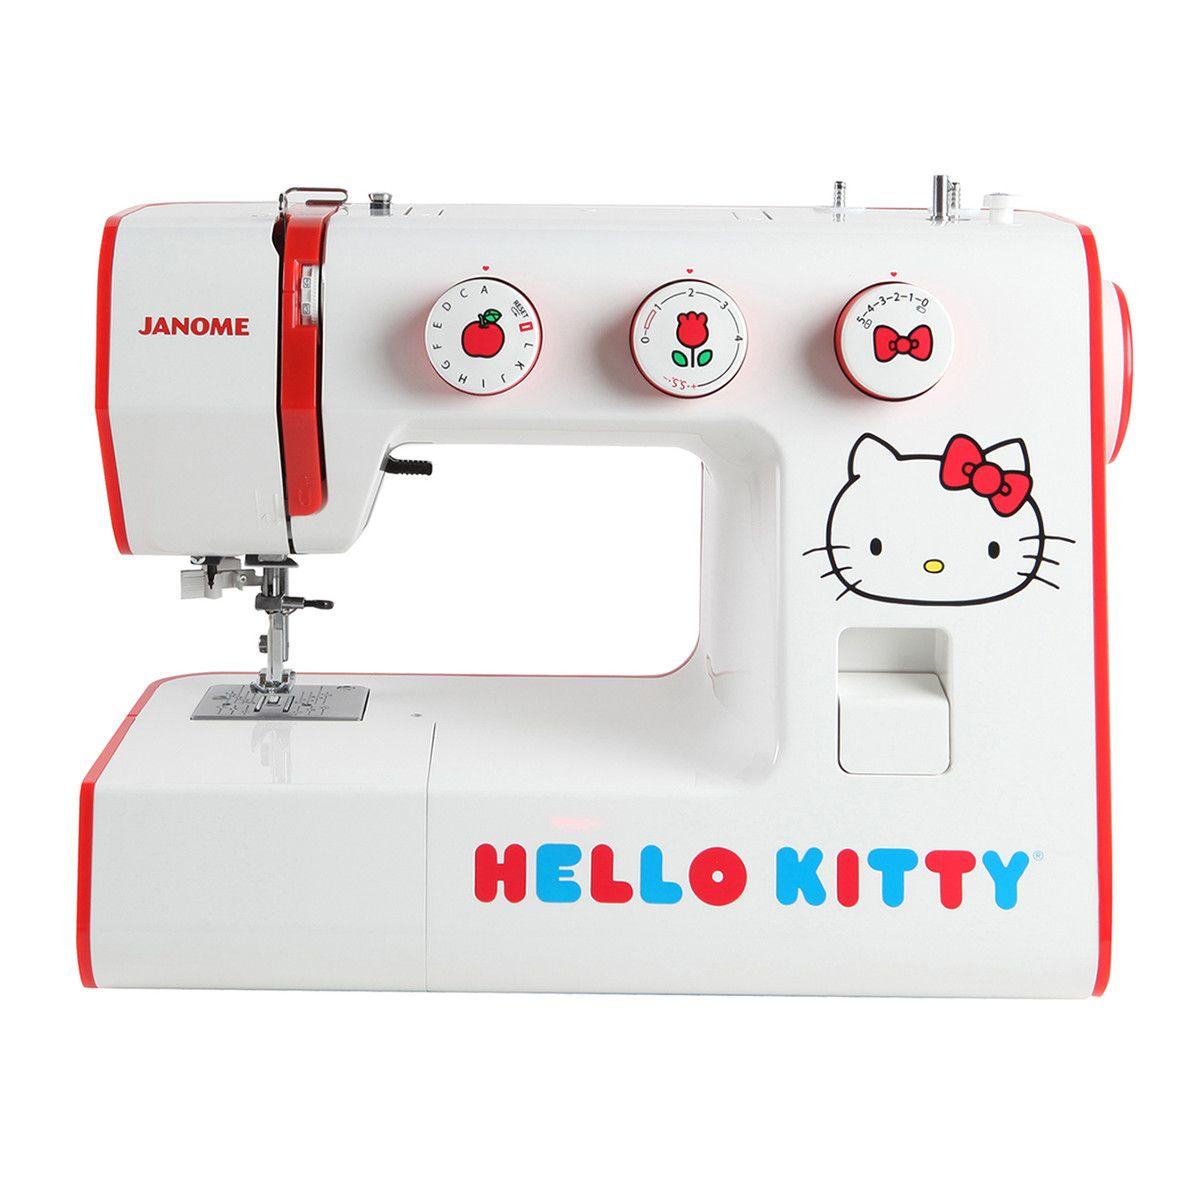 Hello Kitty 15822 Sewing Machine